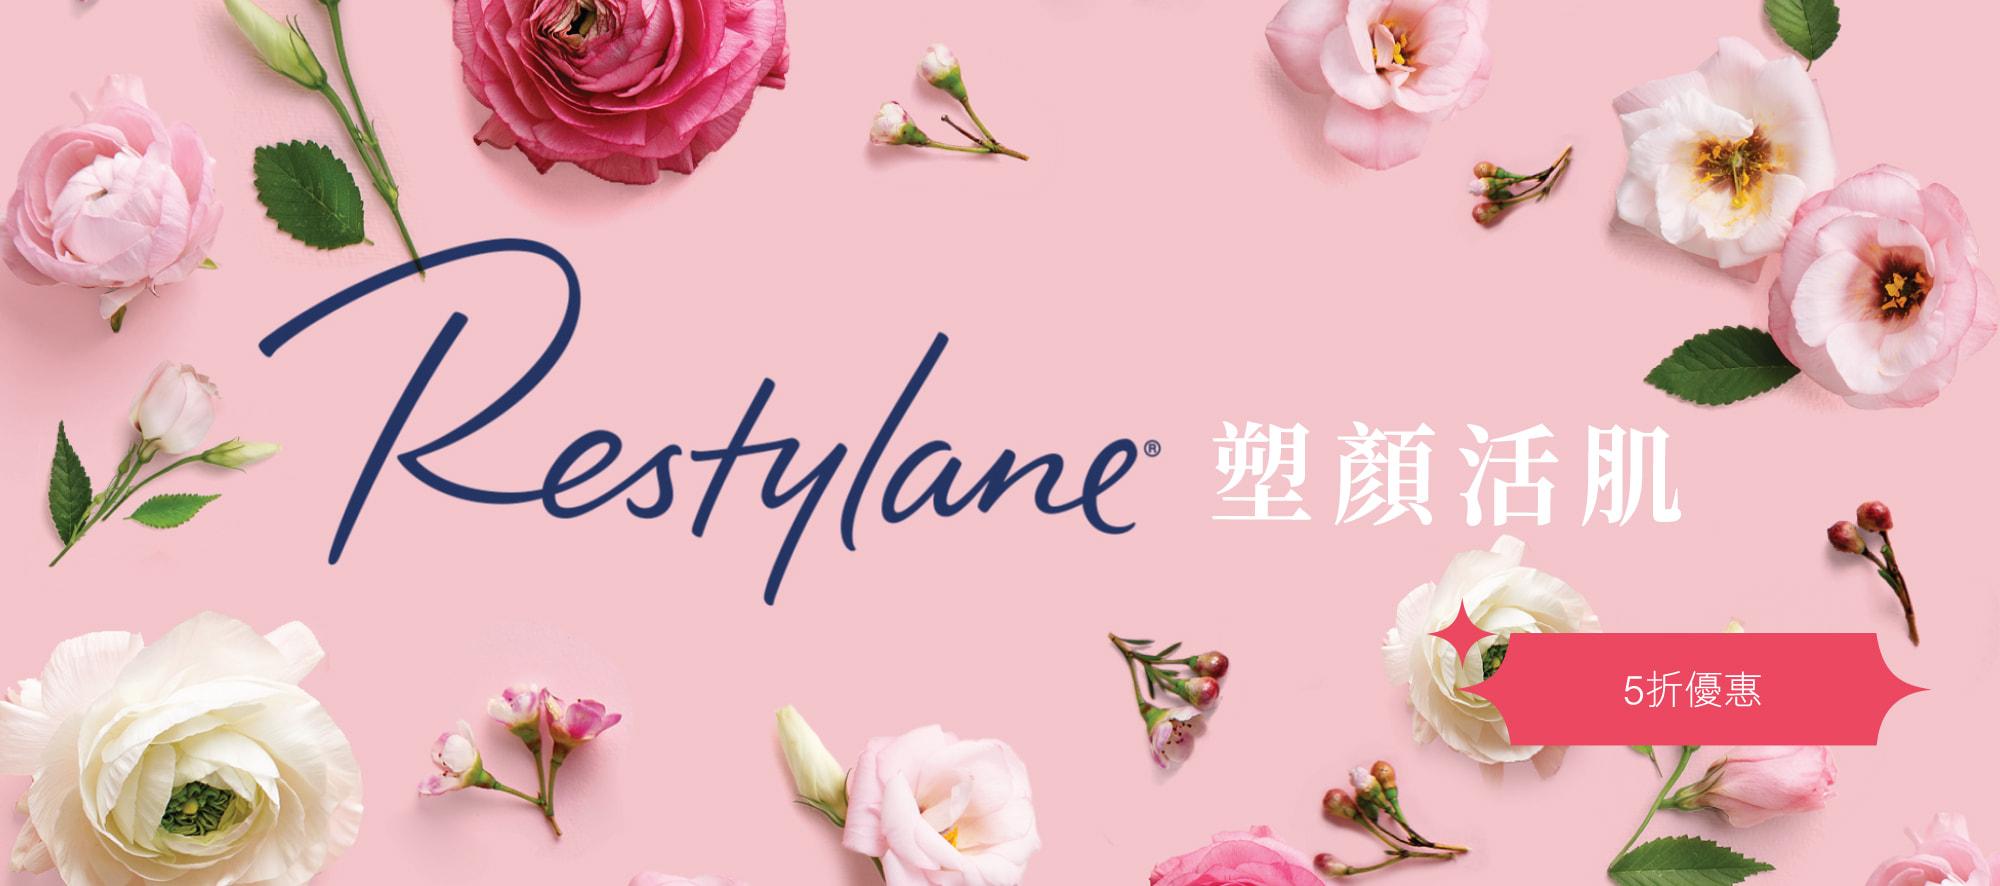 優惠體驗OASIS香港Restylane透明質酸塑顏活肌